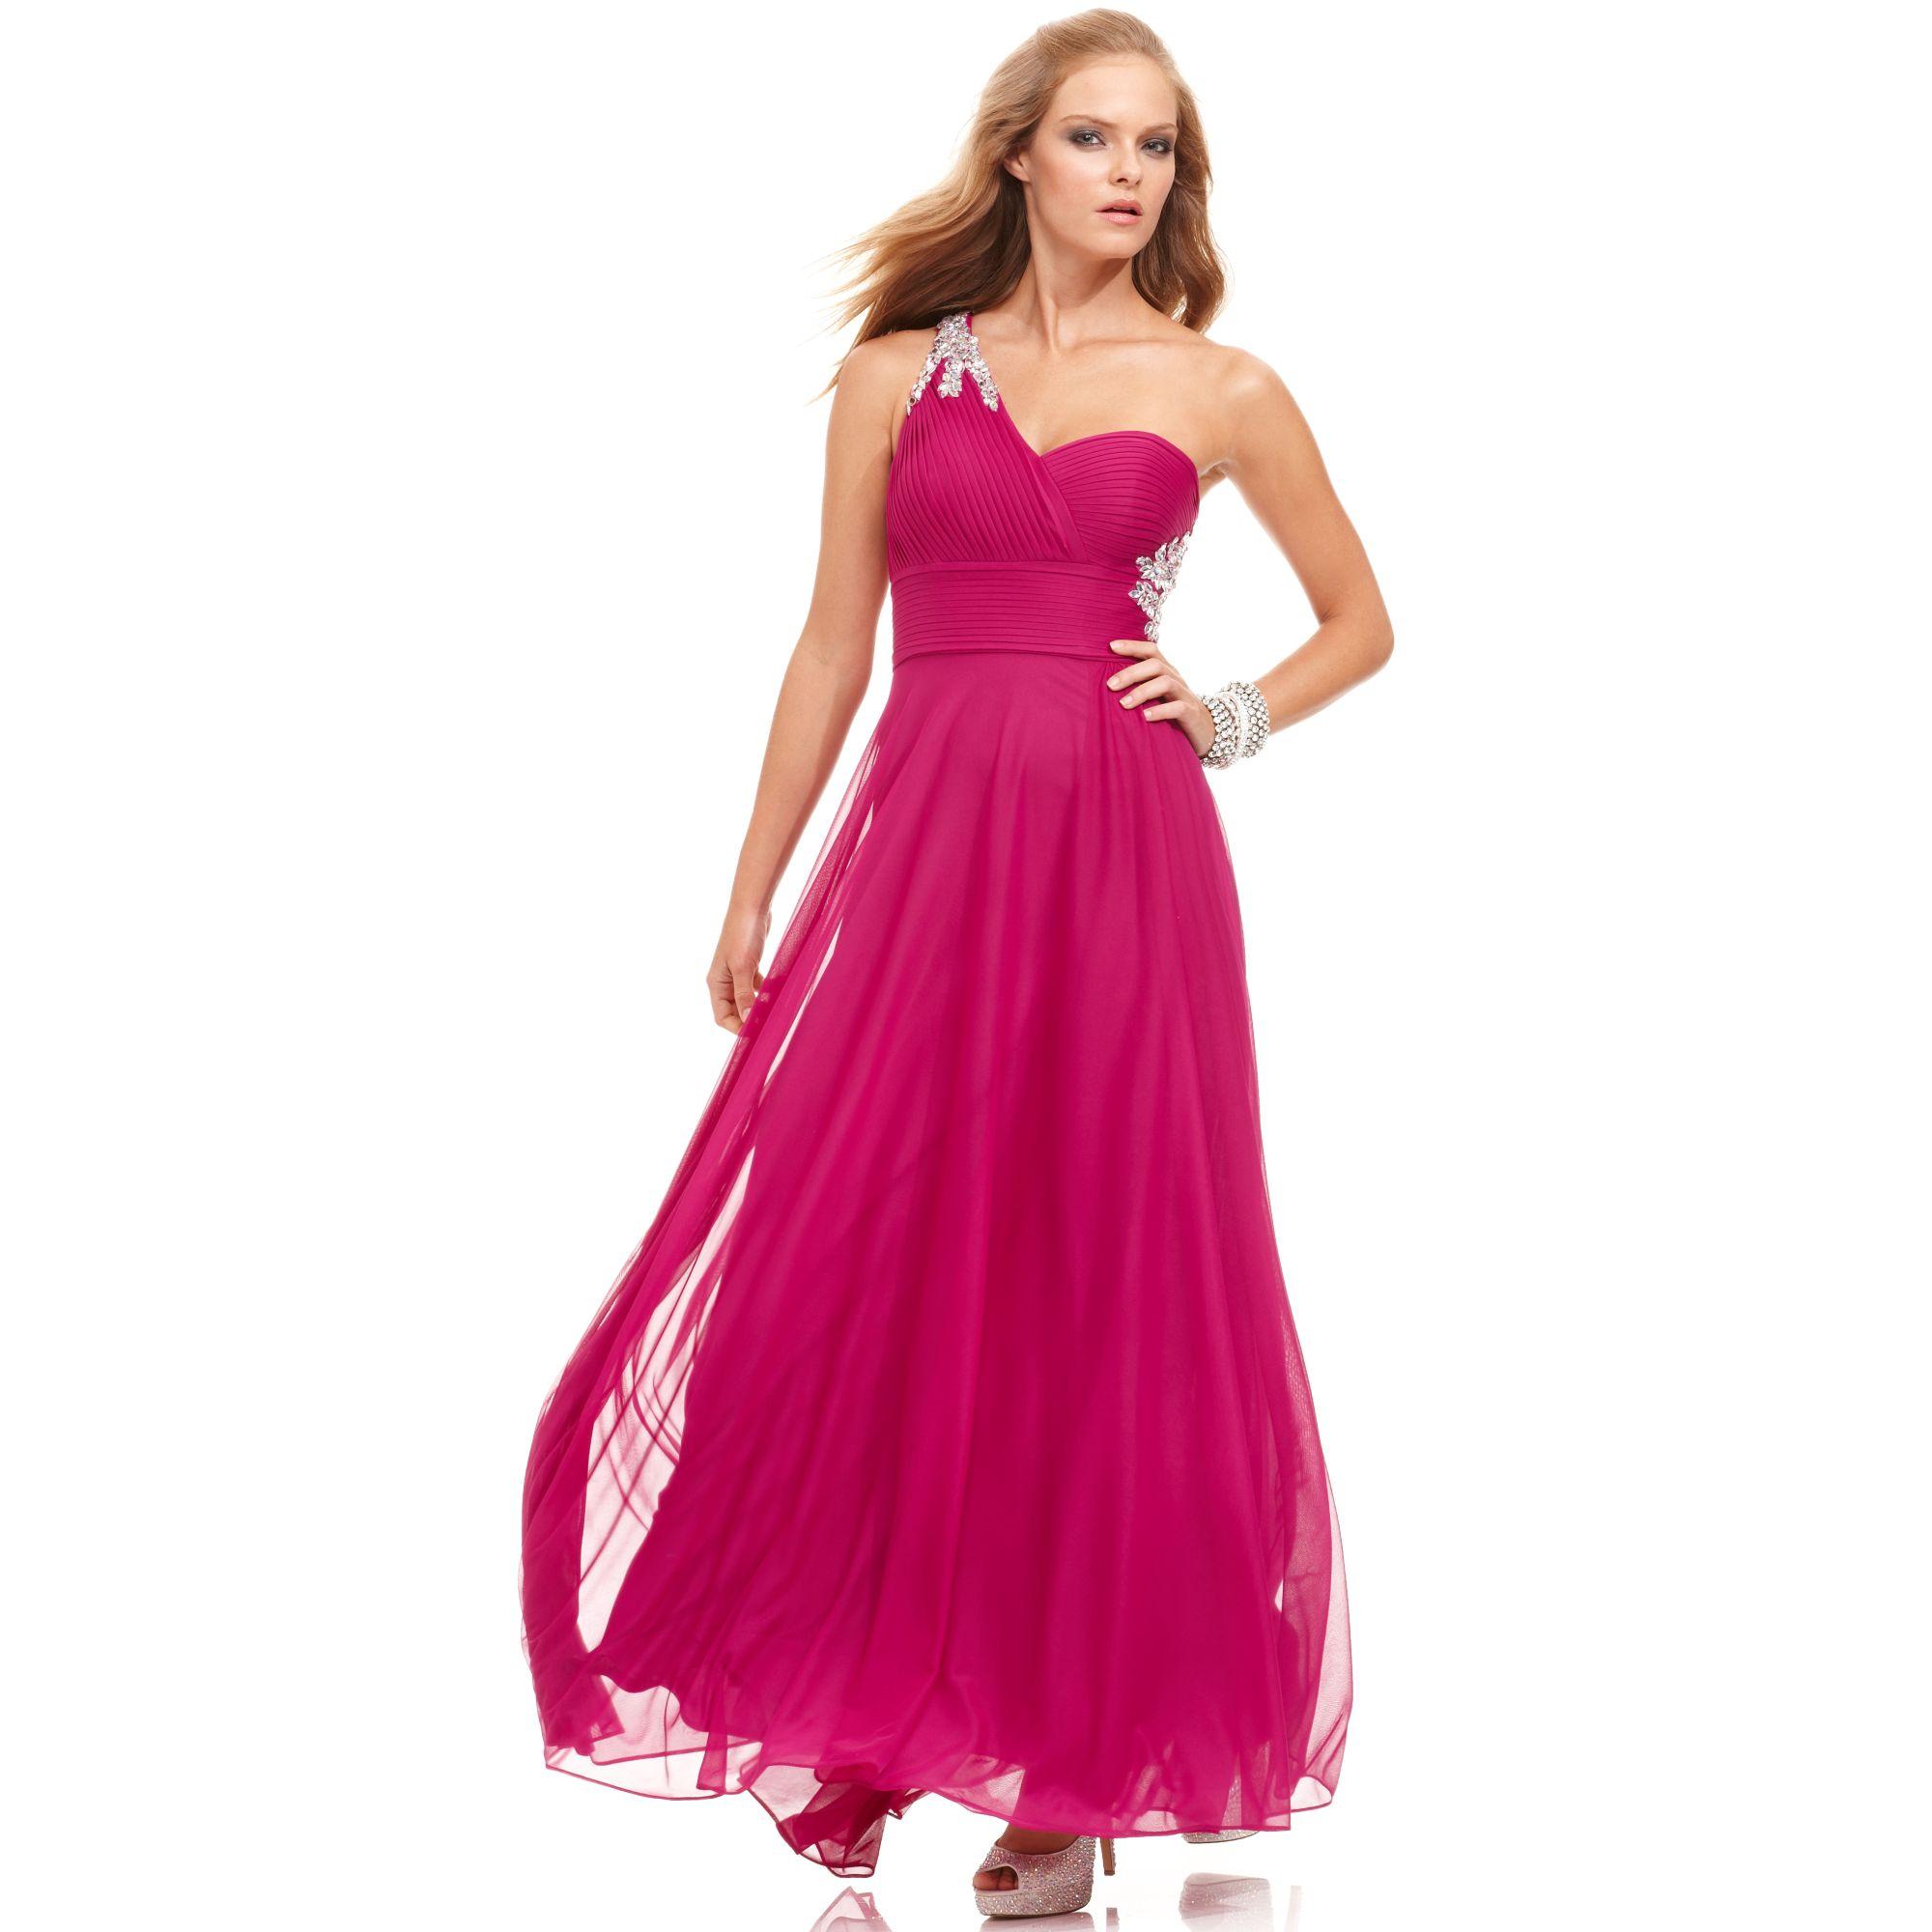 Xscape Sleeveless One Shoulder Beaded Gown Dress in Purple (Iris ...